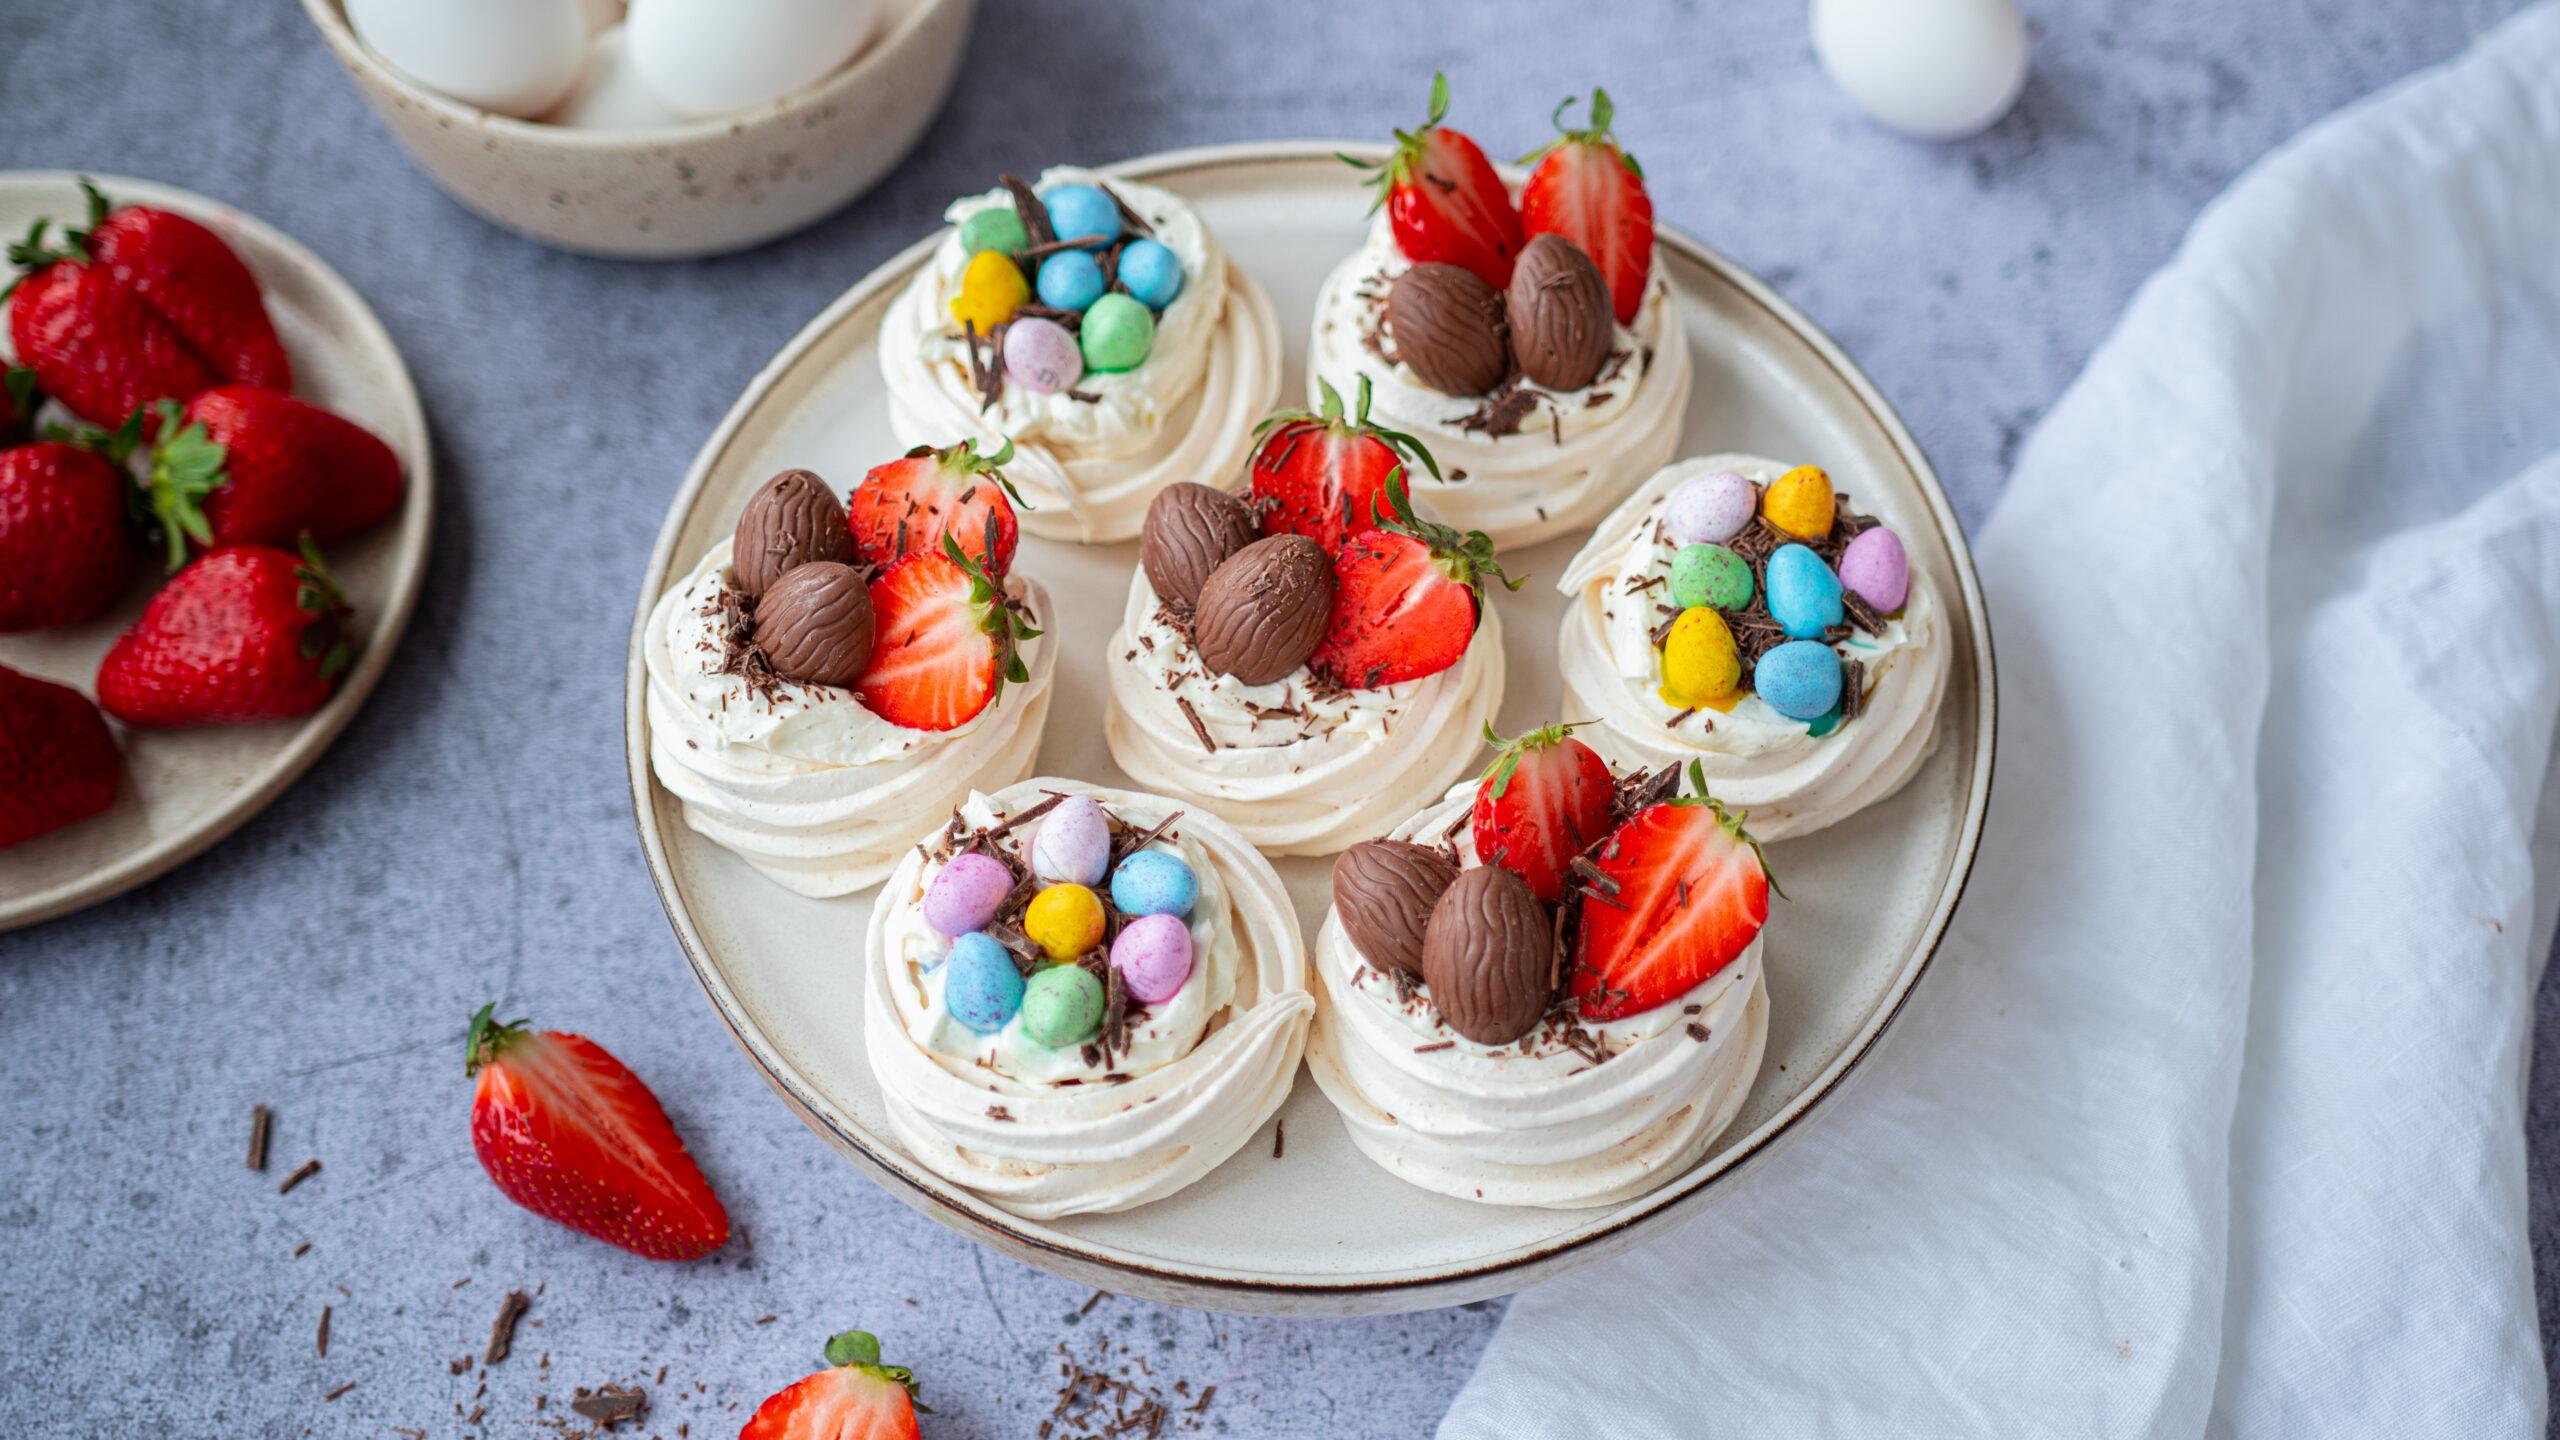 Gastro blogeri vam donose recepte za uskrsno blagovanje!